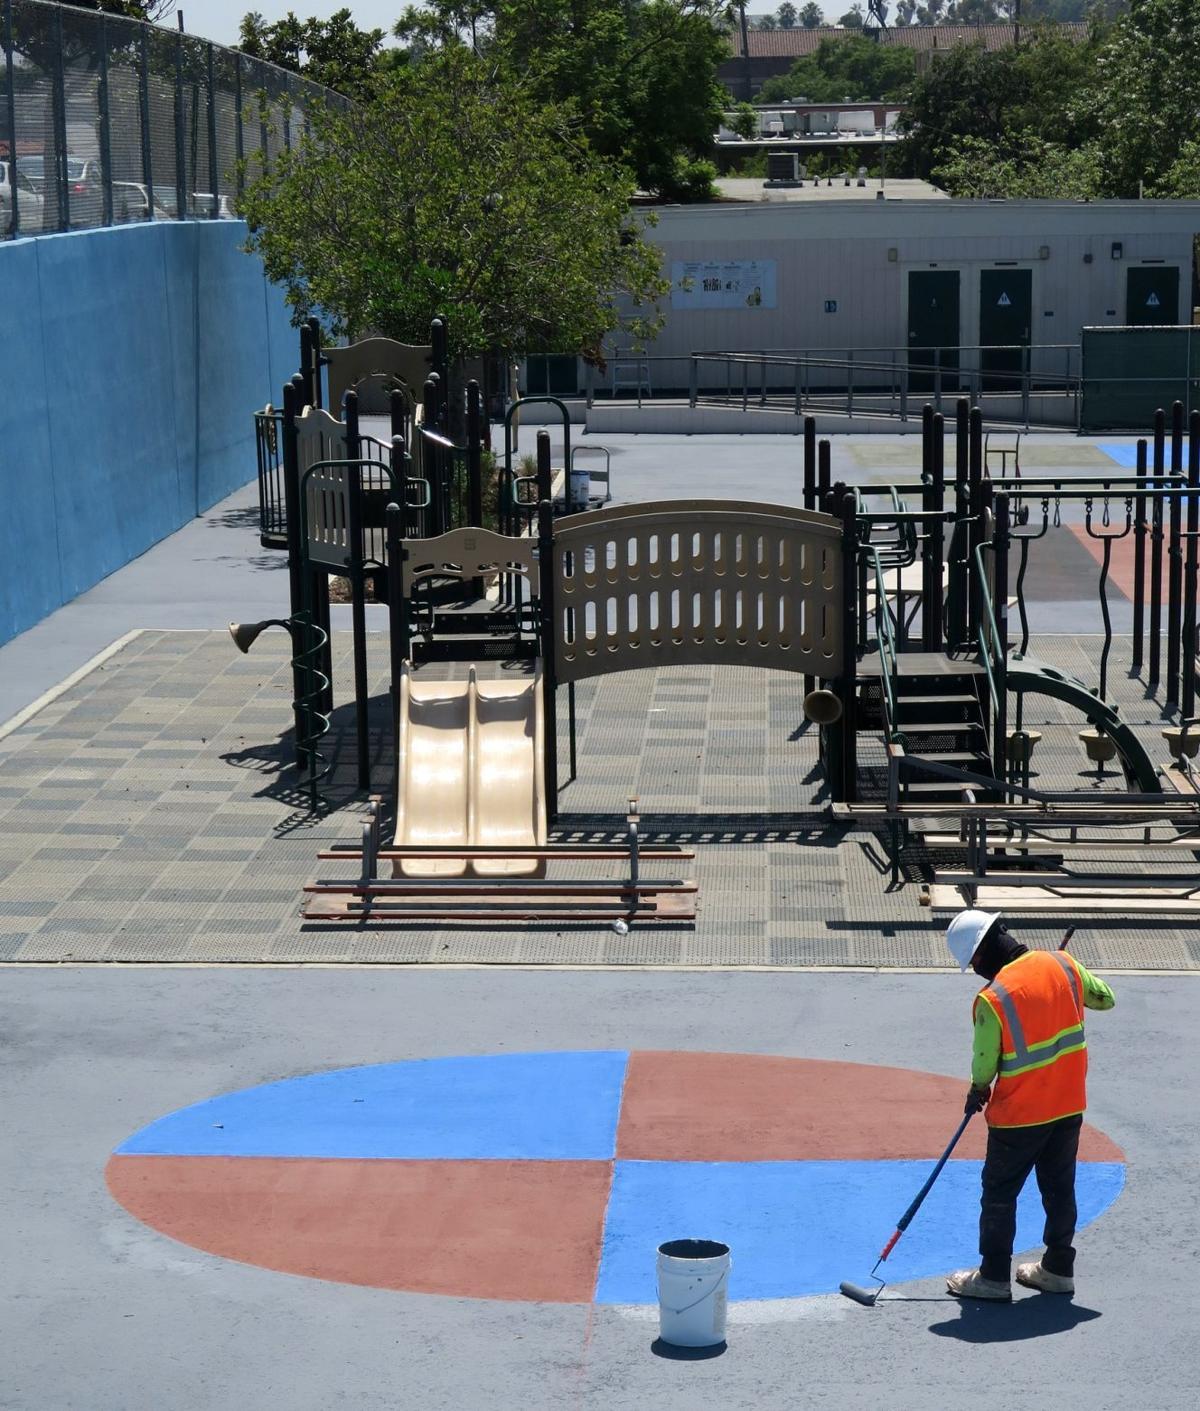 Logan Street School Playground being painted